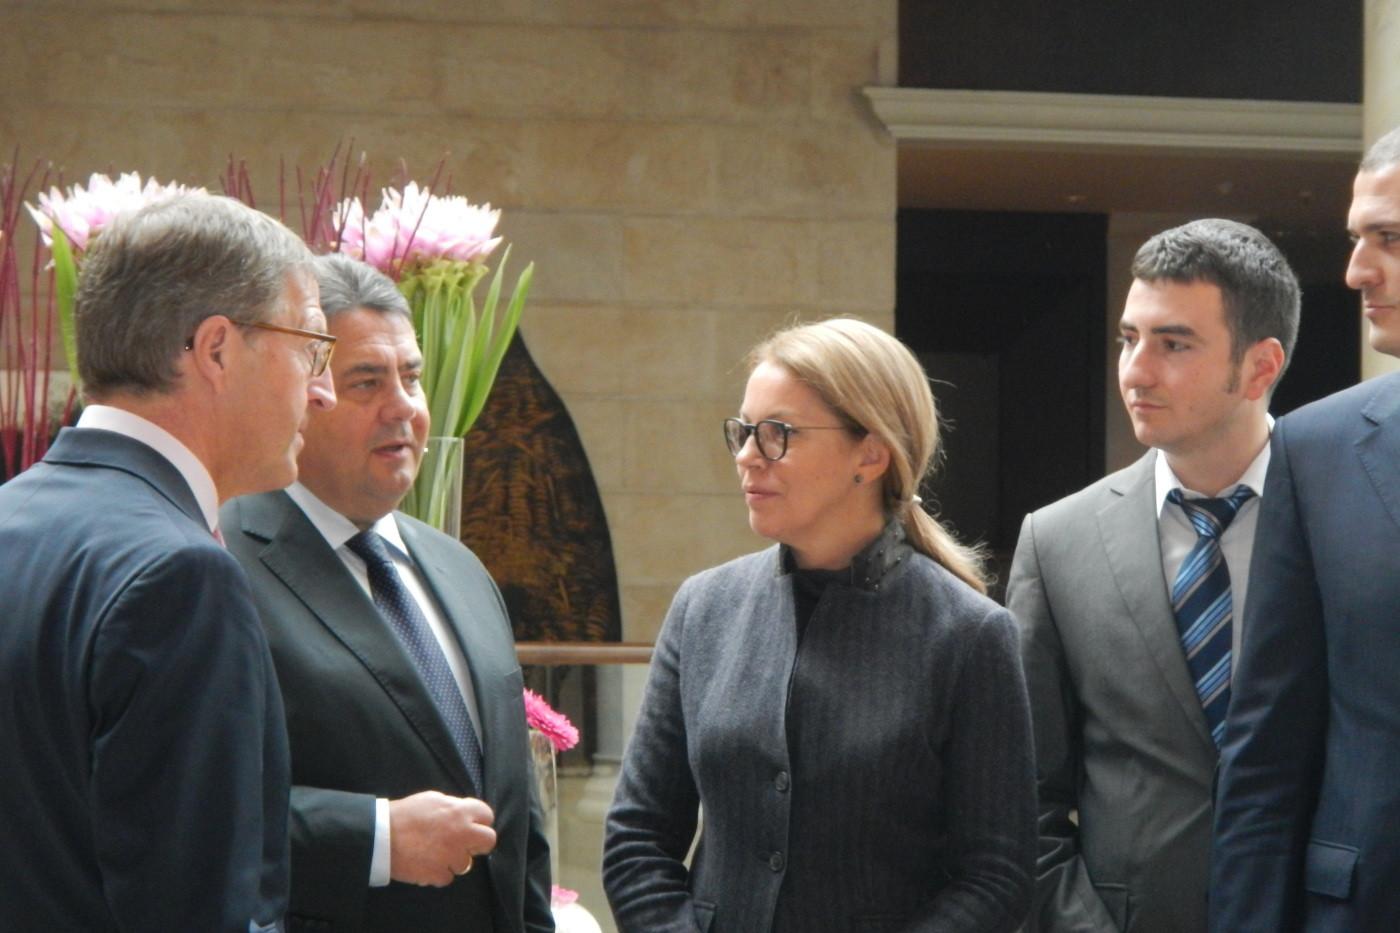 Vice Chancellor Sigmar, Ruzica Djindjic and alumni